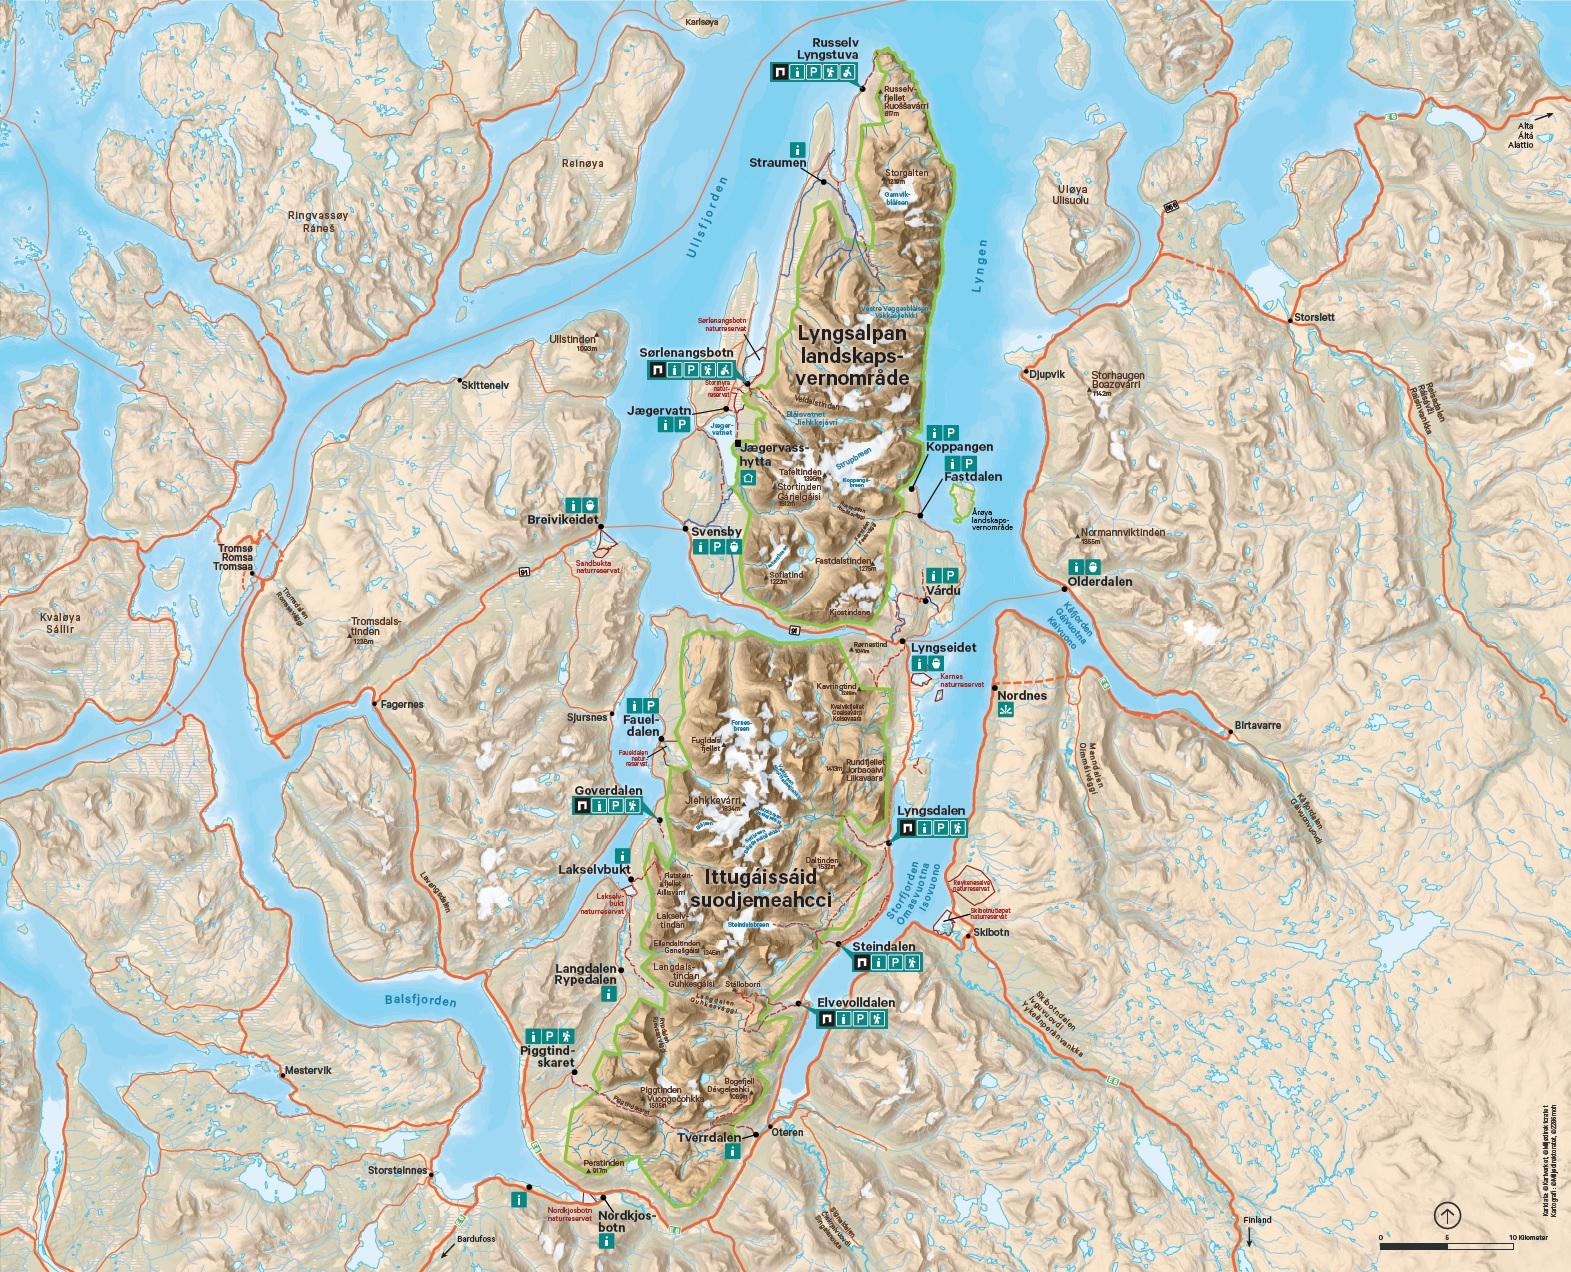 Kart over Lyngsalpan landskapsvernområde